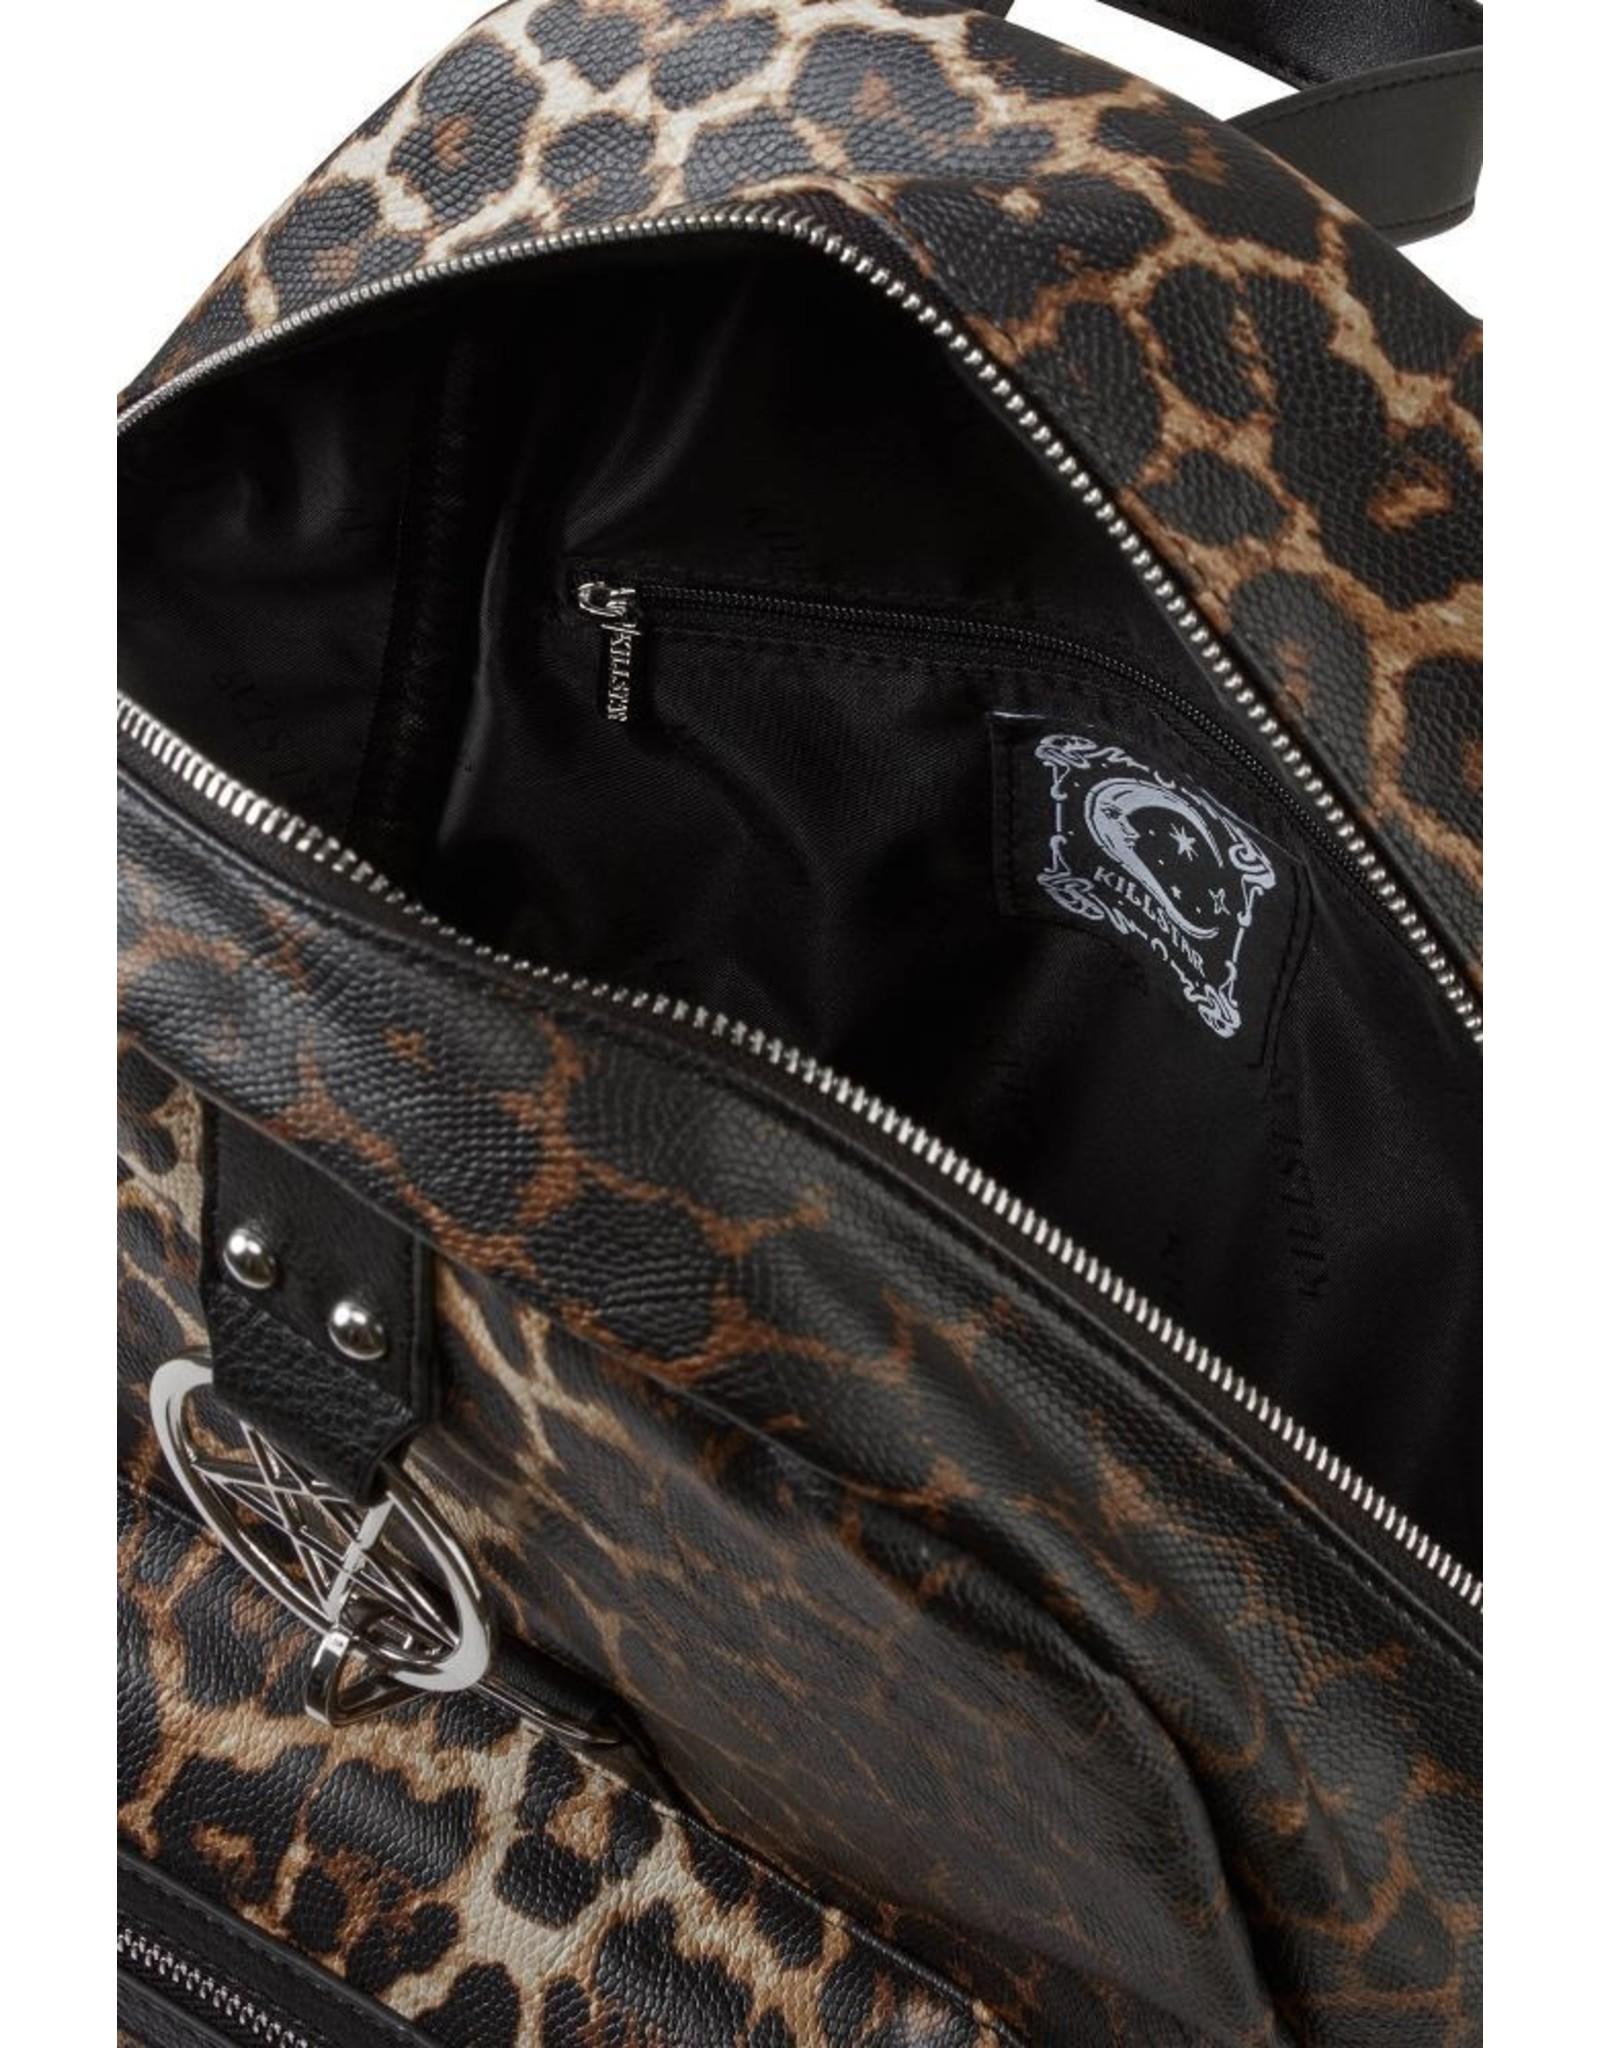 Killstar Killstar bags and accessiries - Killstar backpack Primal Scream (leopard)